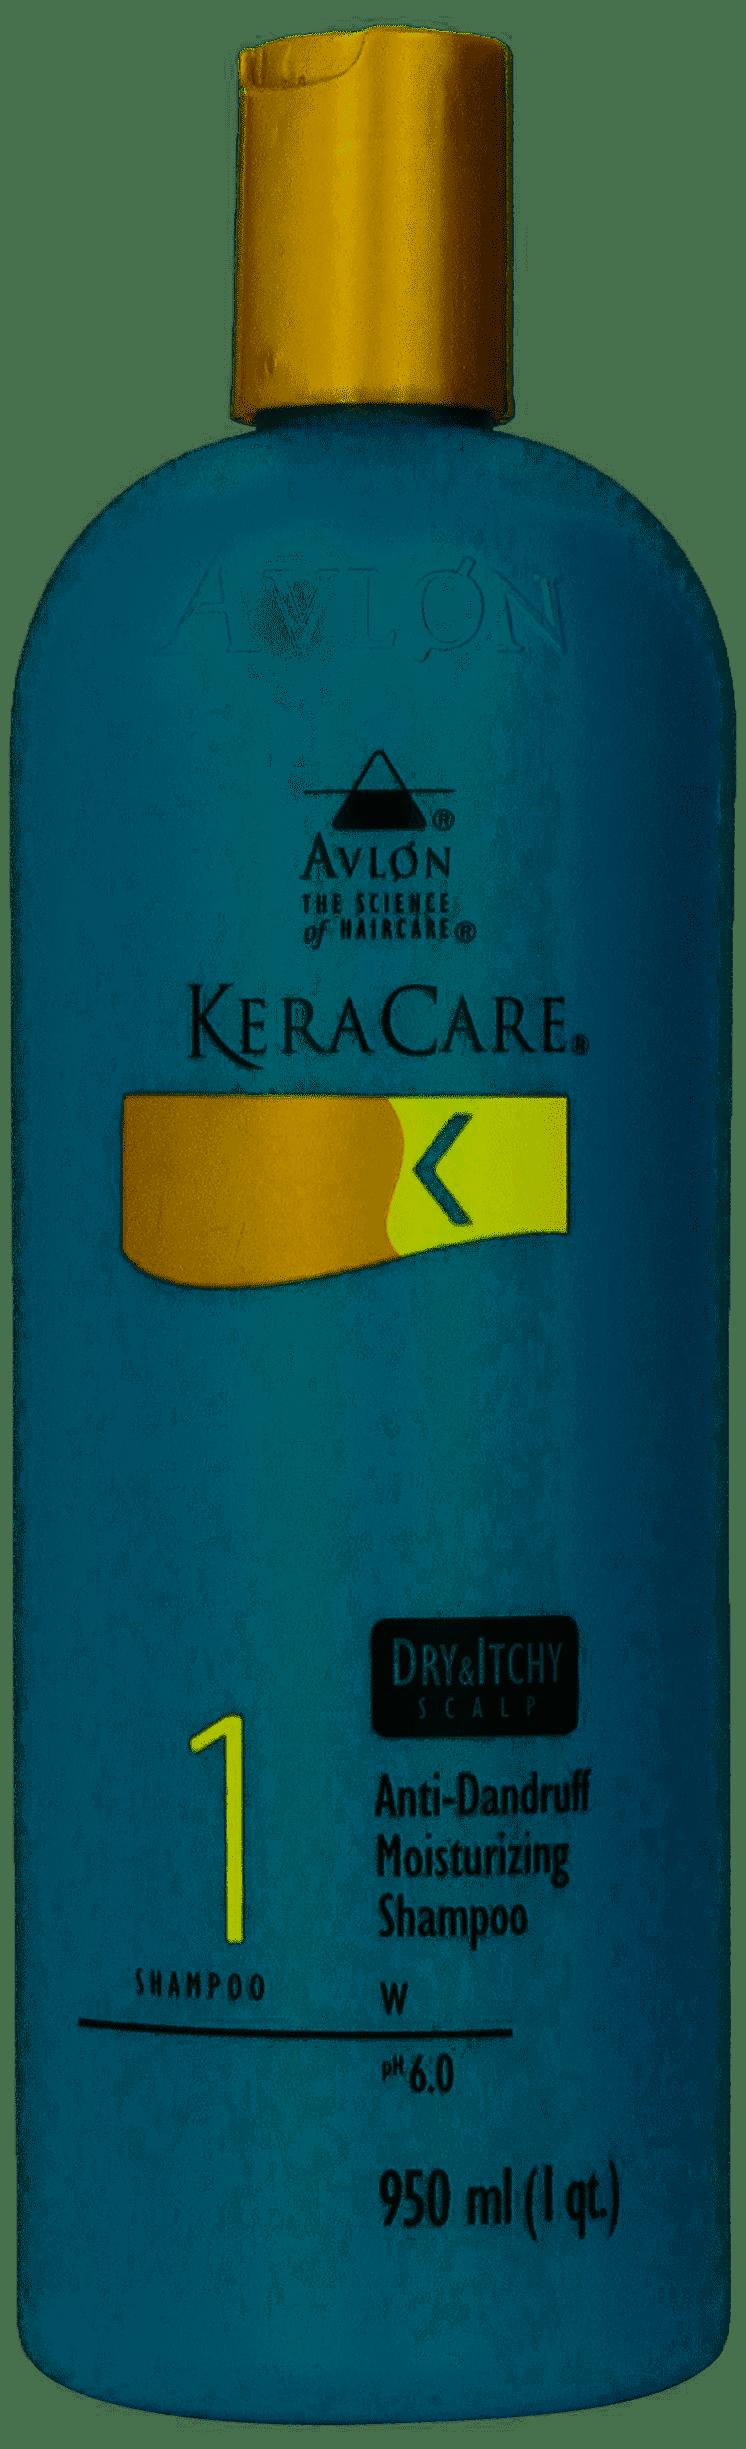 Buy Avlon Keracare Dry & Itchy Scalp Anti-dandruff Moisturizing Shampoo 32 Oz/950 Ml